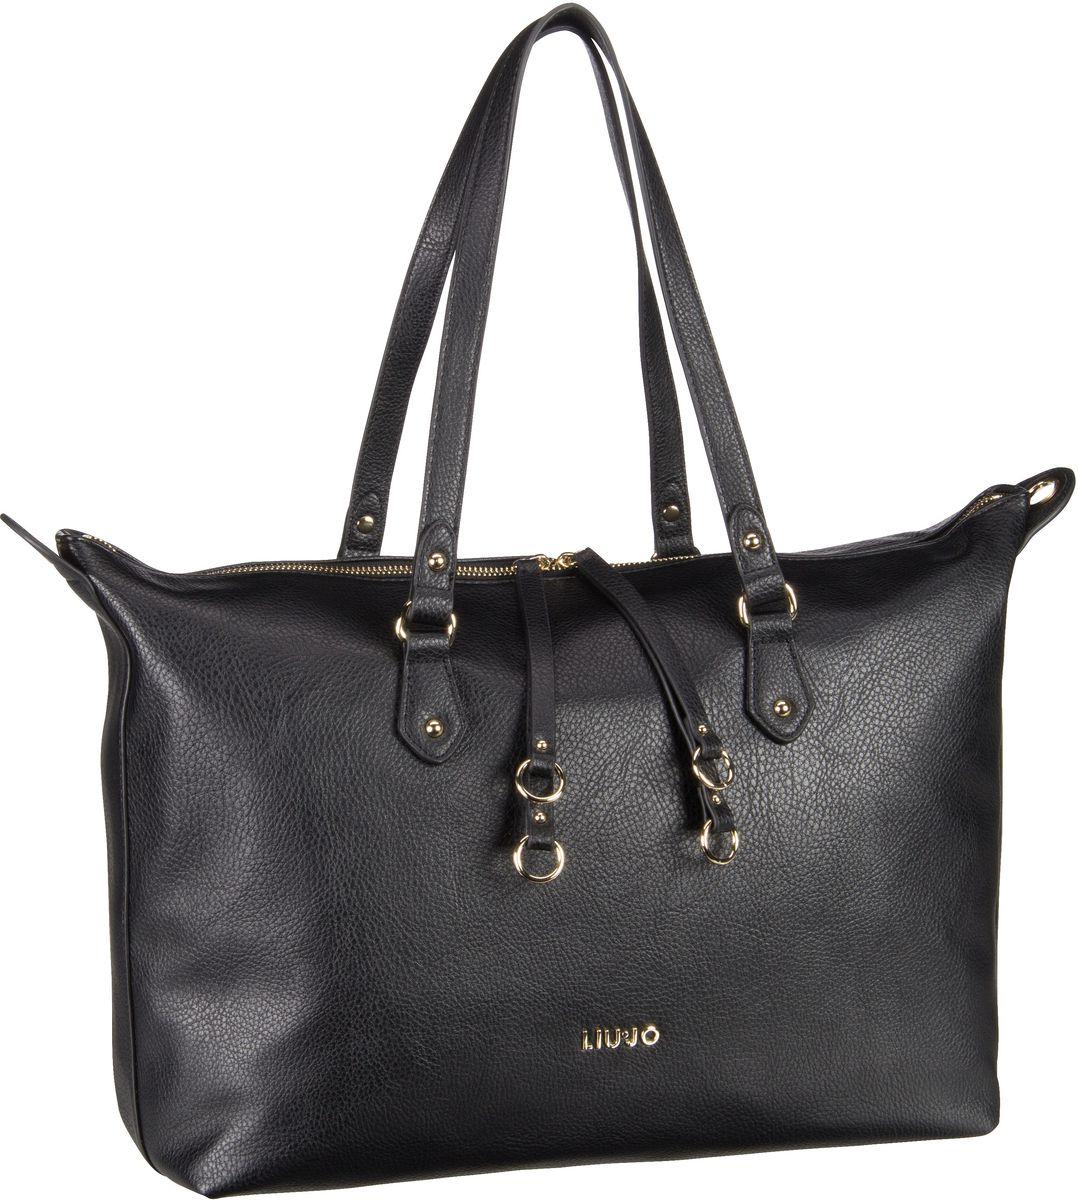 Liu Jo Eze Shopping L Nero - Handtasche